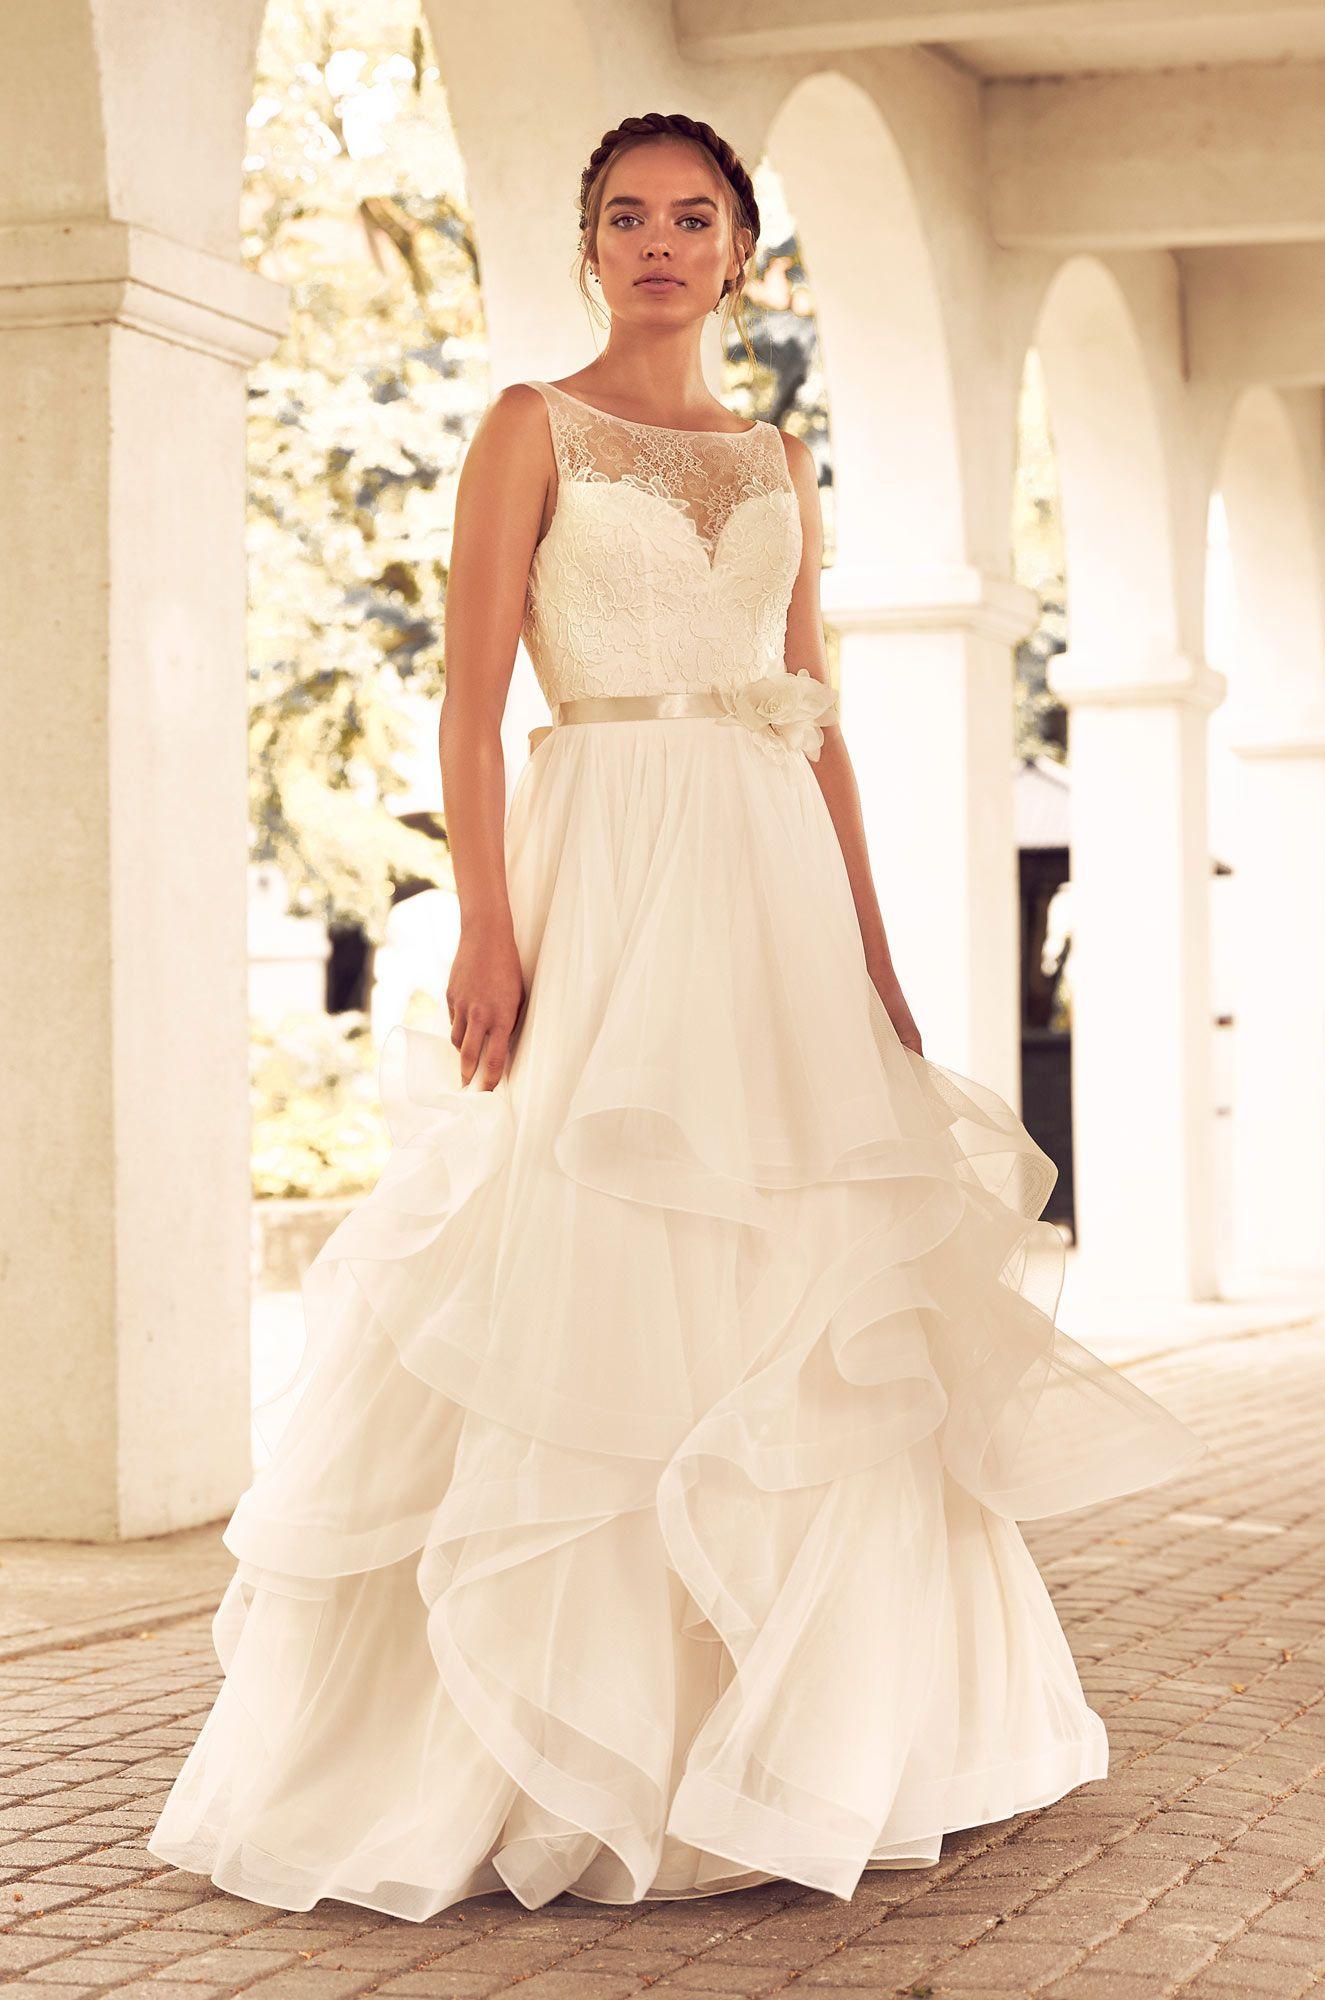 Tulle ruffle wedding dress style tulle skirts bodice and